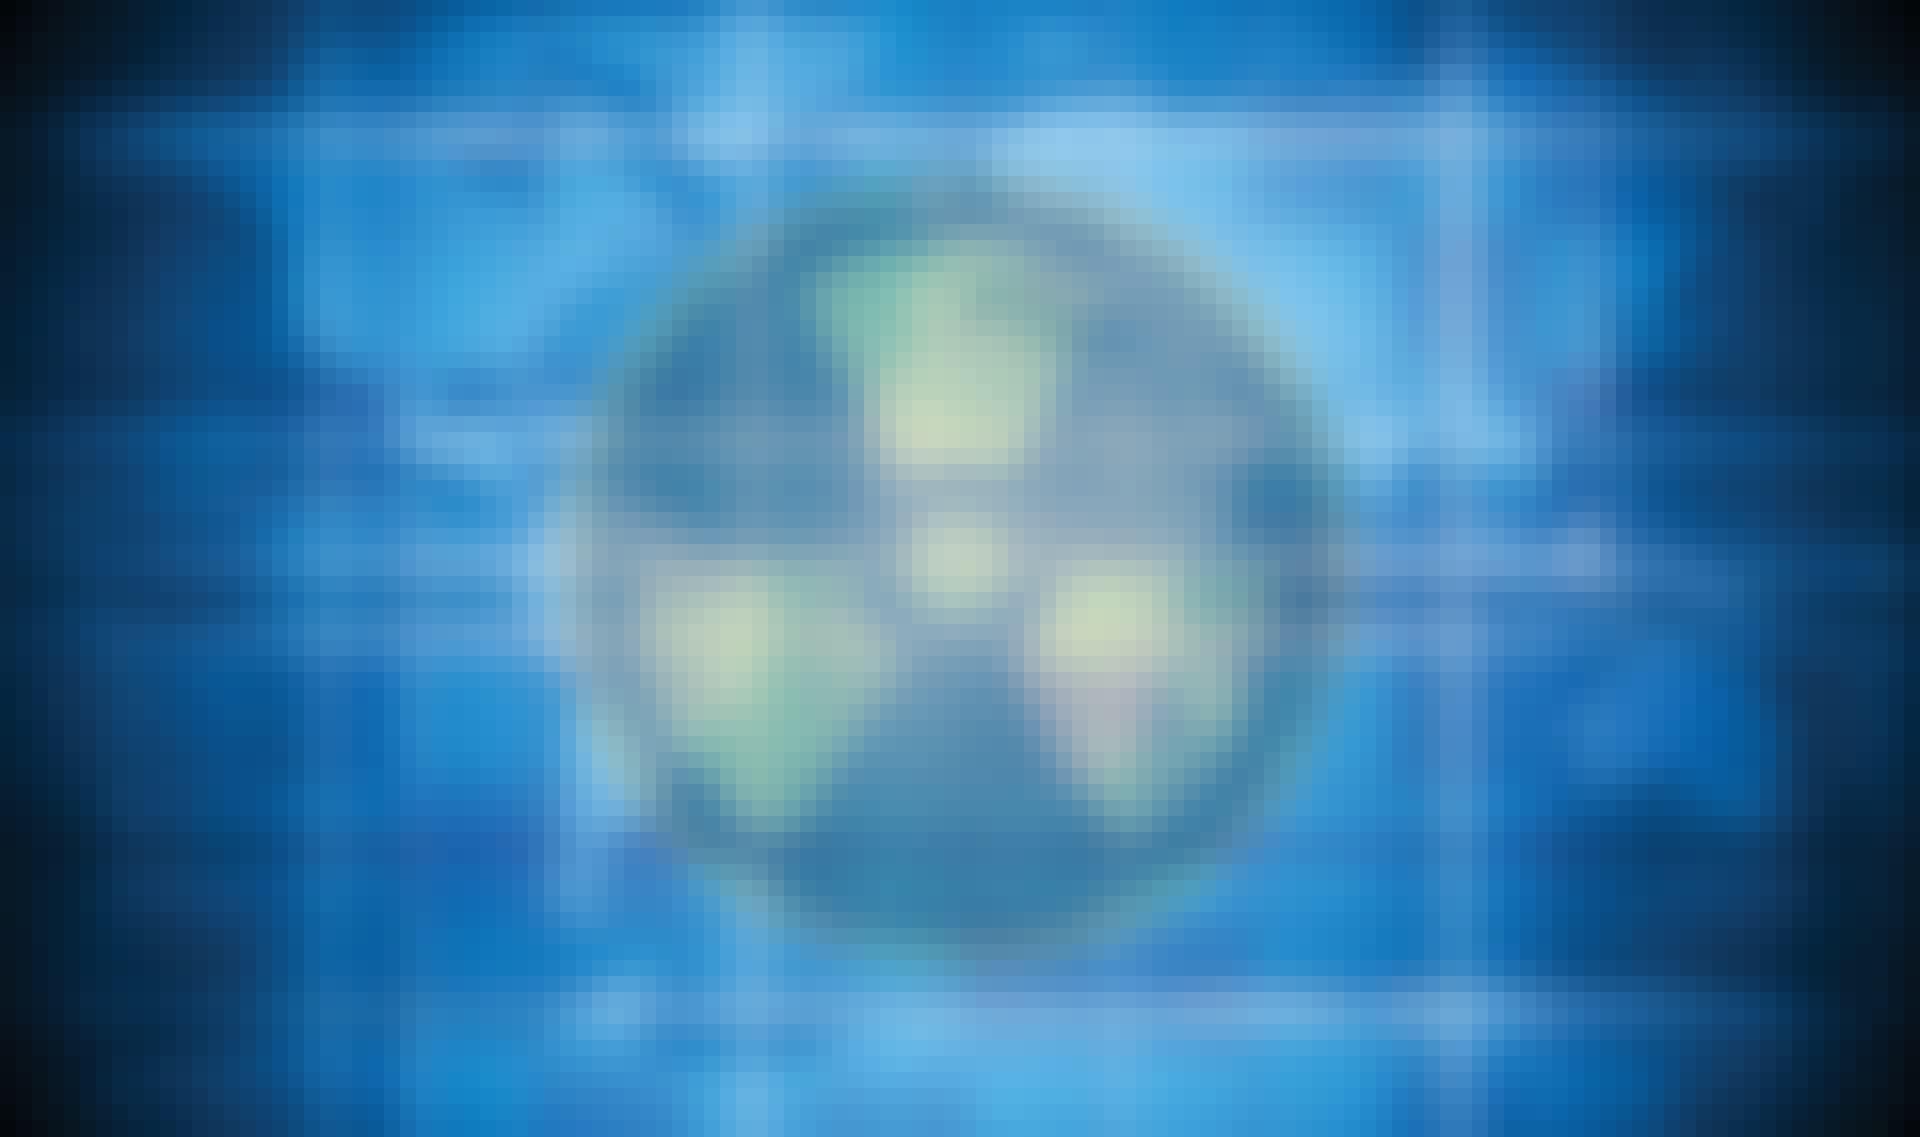 verdenskort radioaktivitet